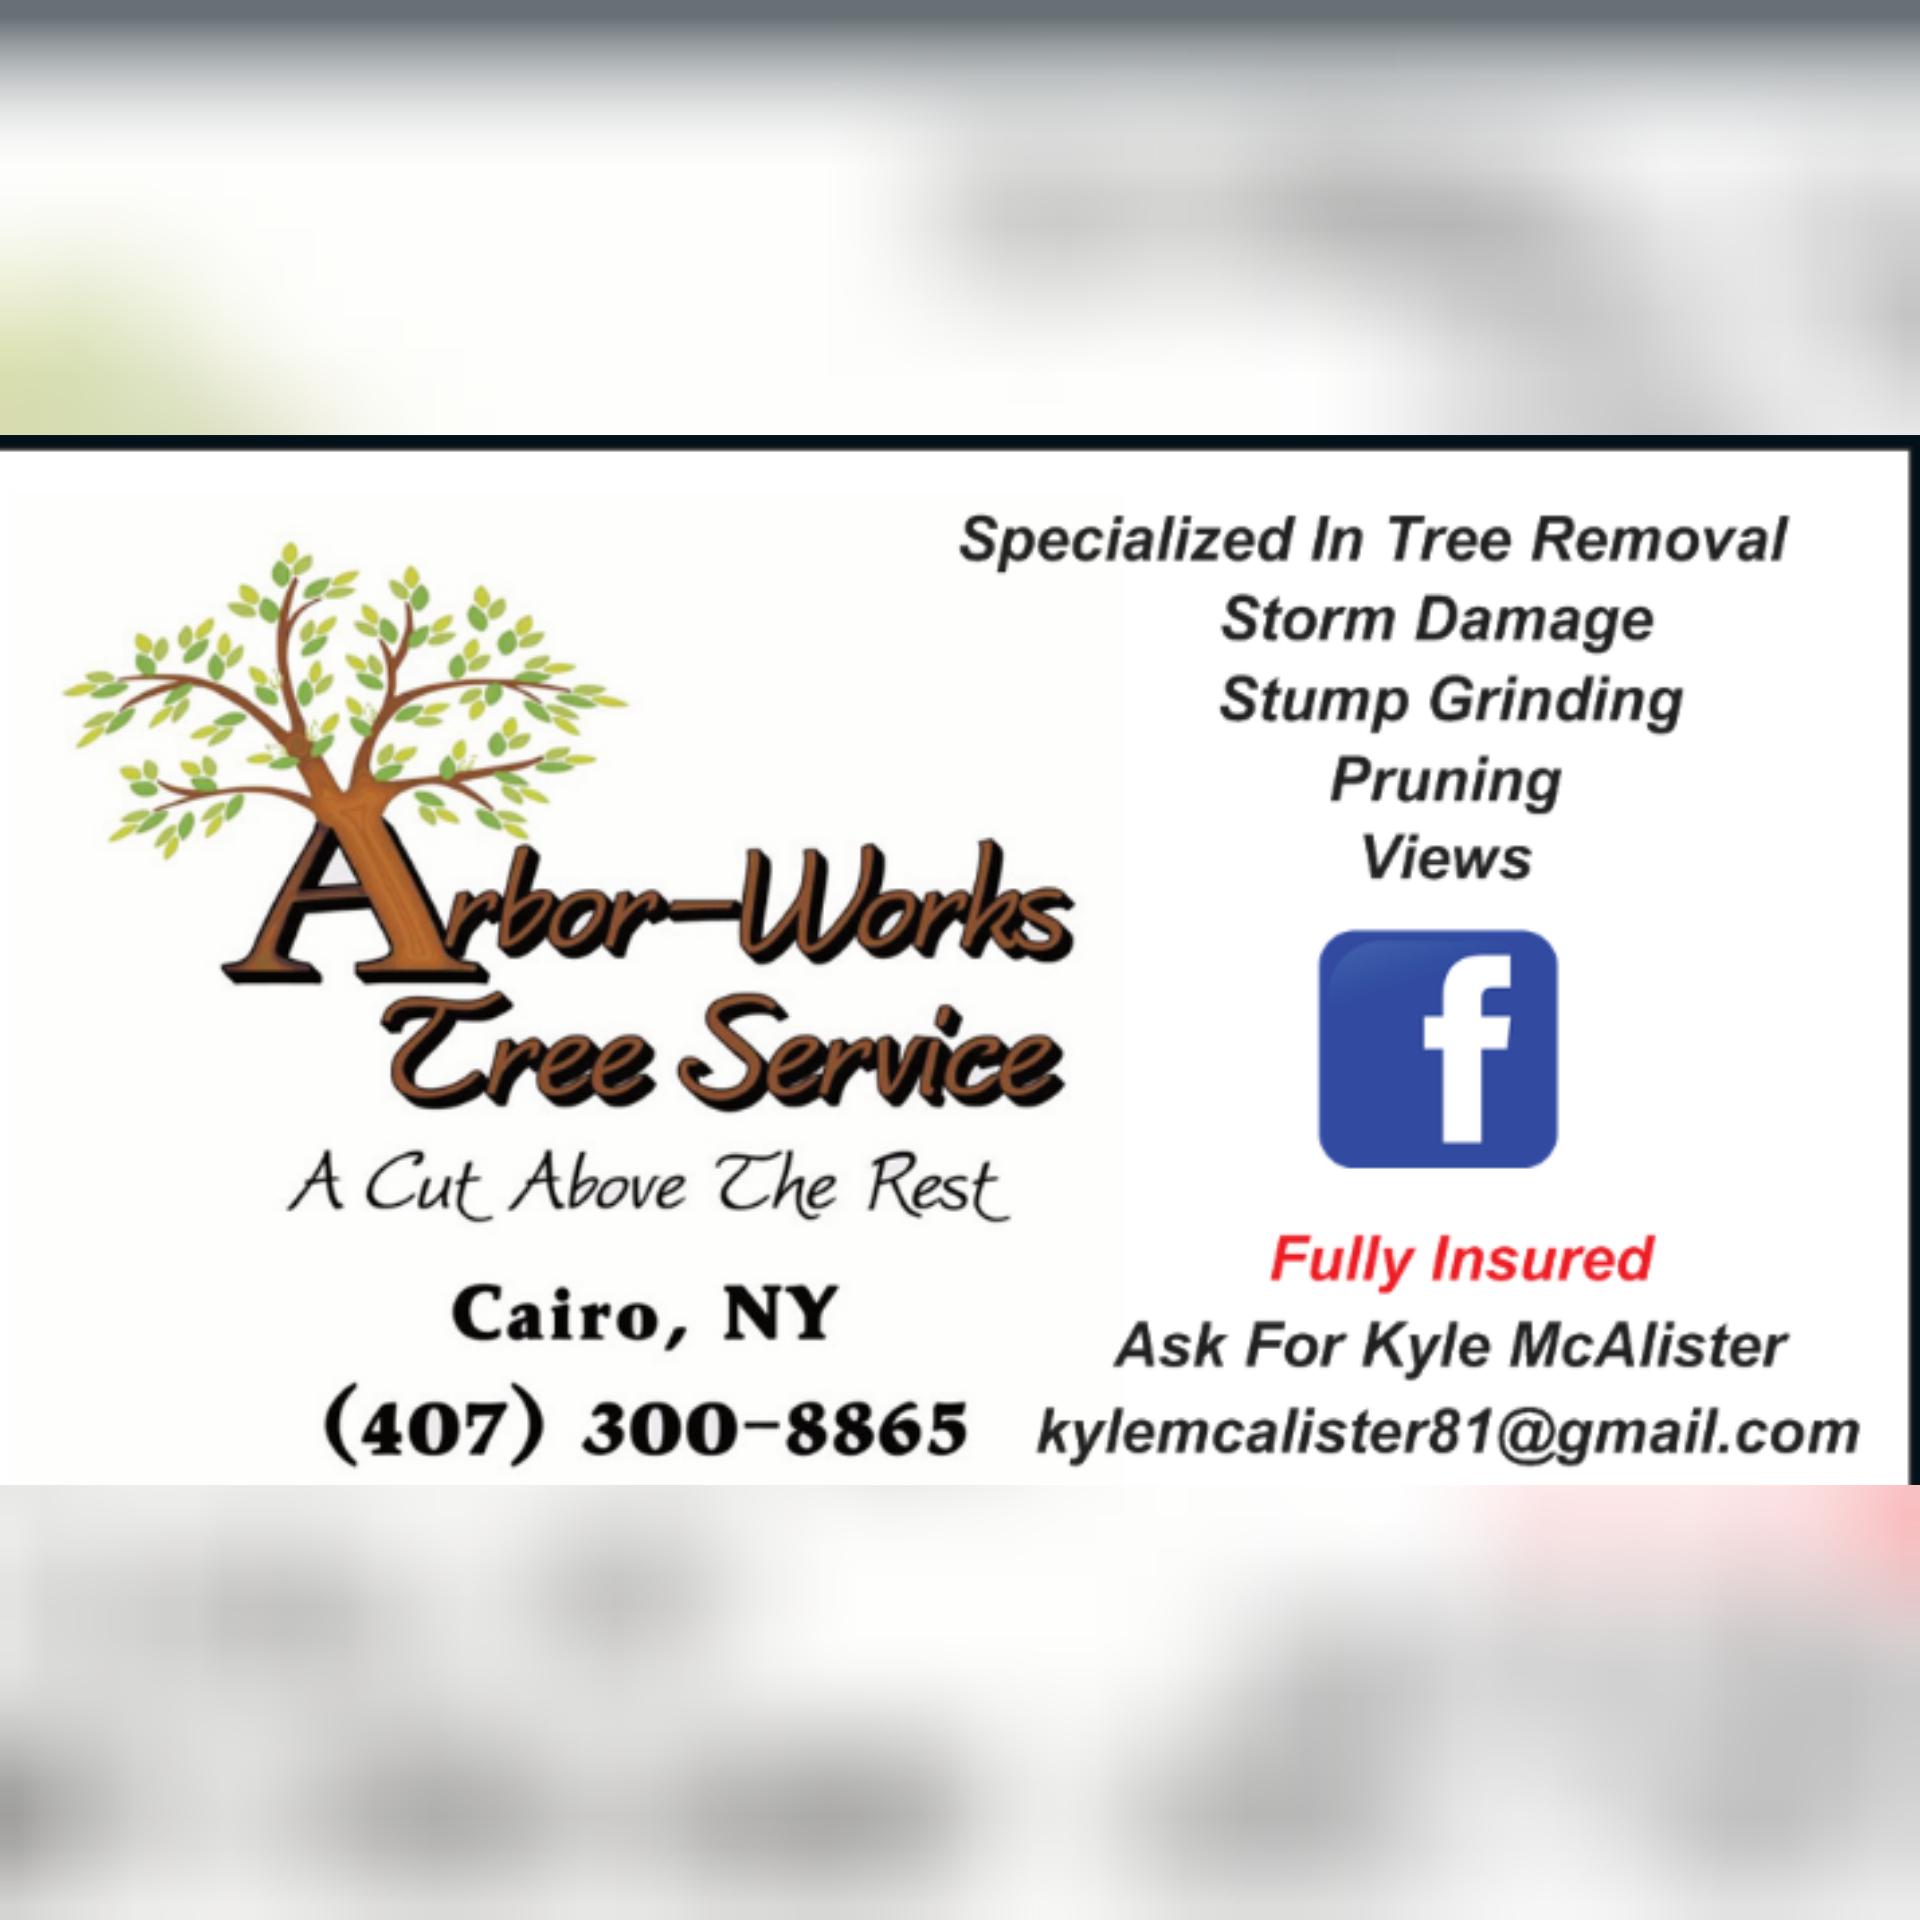 Arbor-works